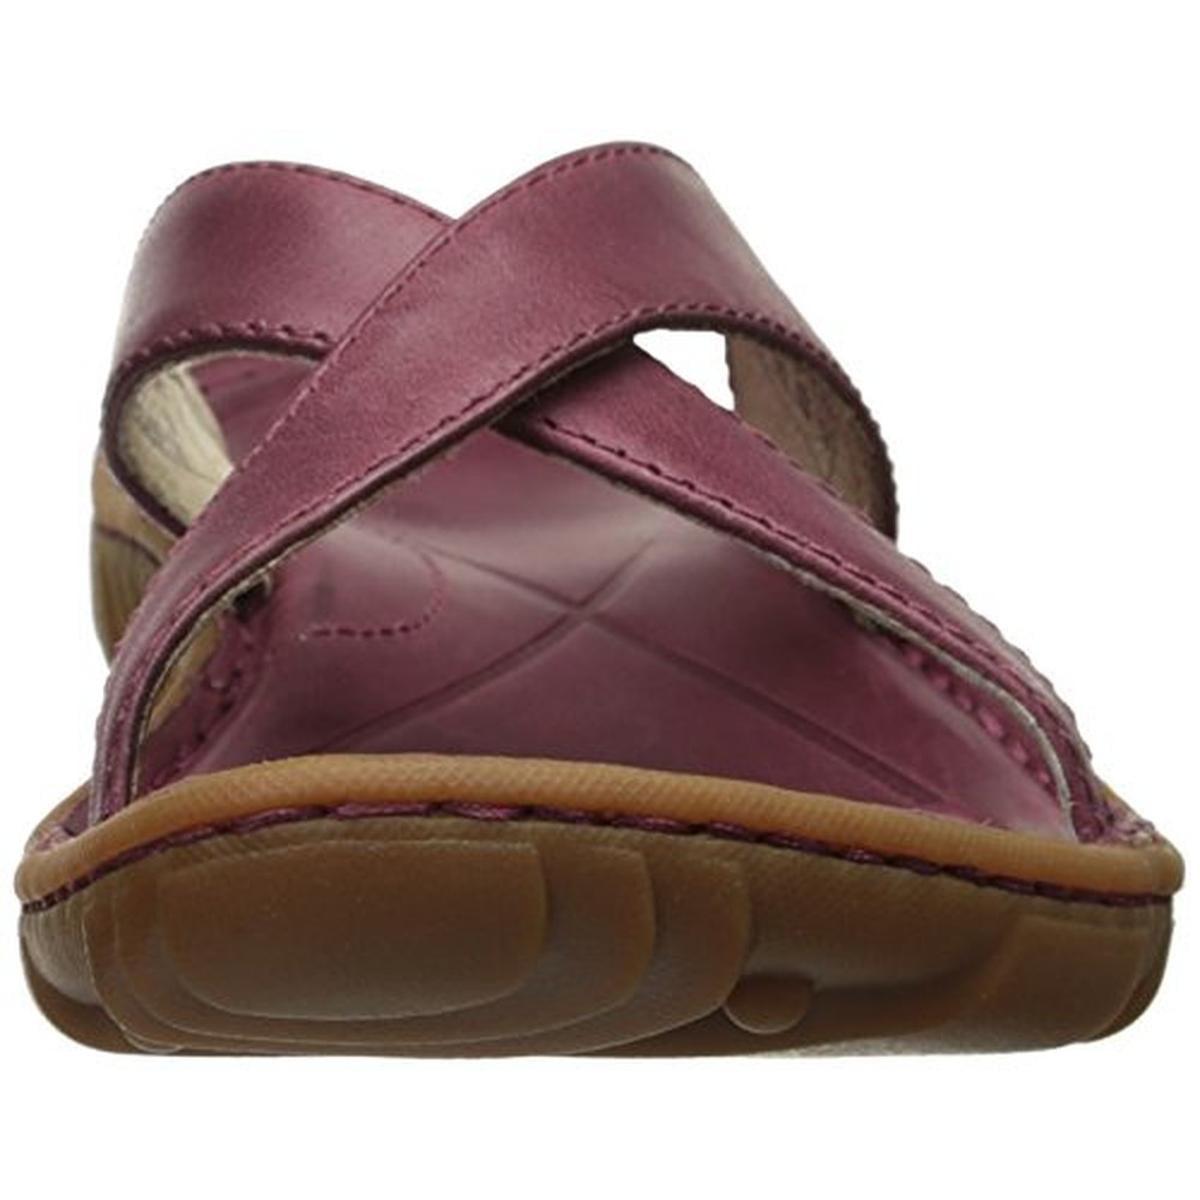 Bogs Soft Outdoor Shoes Womens Todos Soft Bogs Leather Rebound Slide 71693 df607e